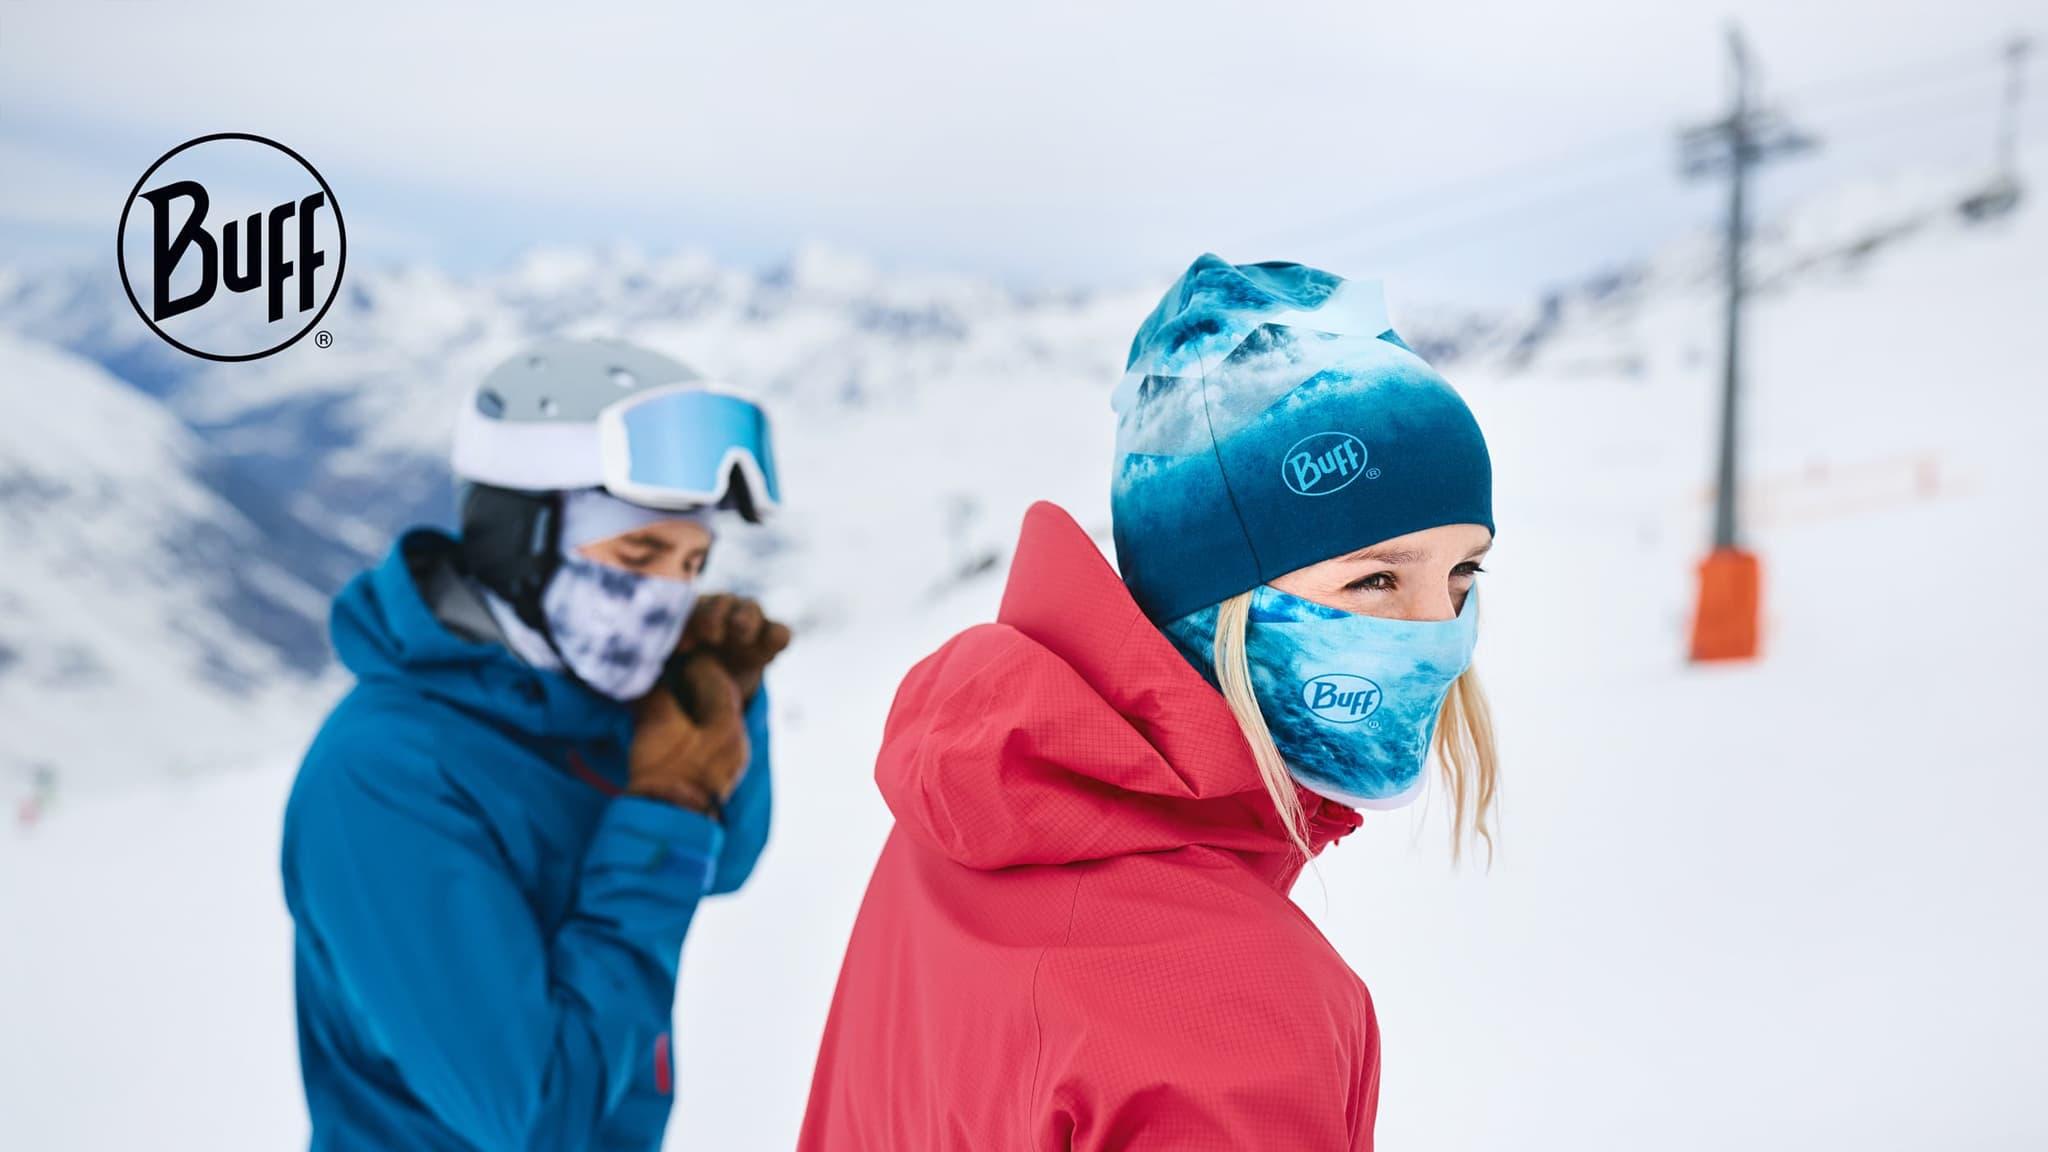 two people on ski hill wearing Buff